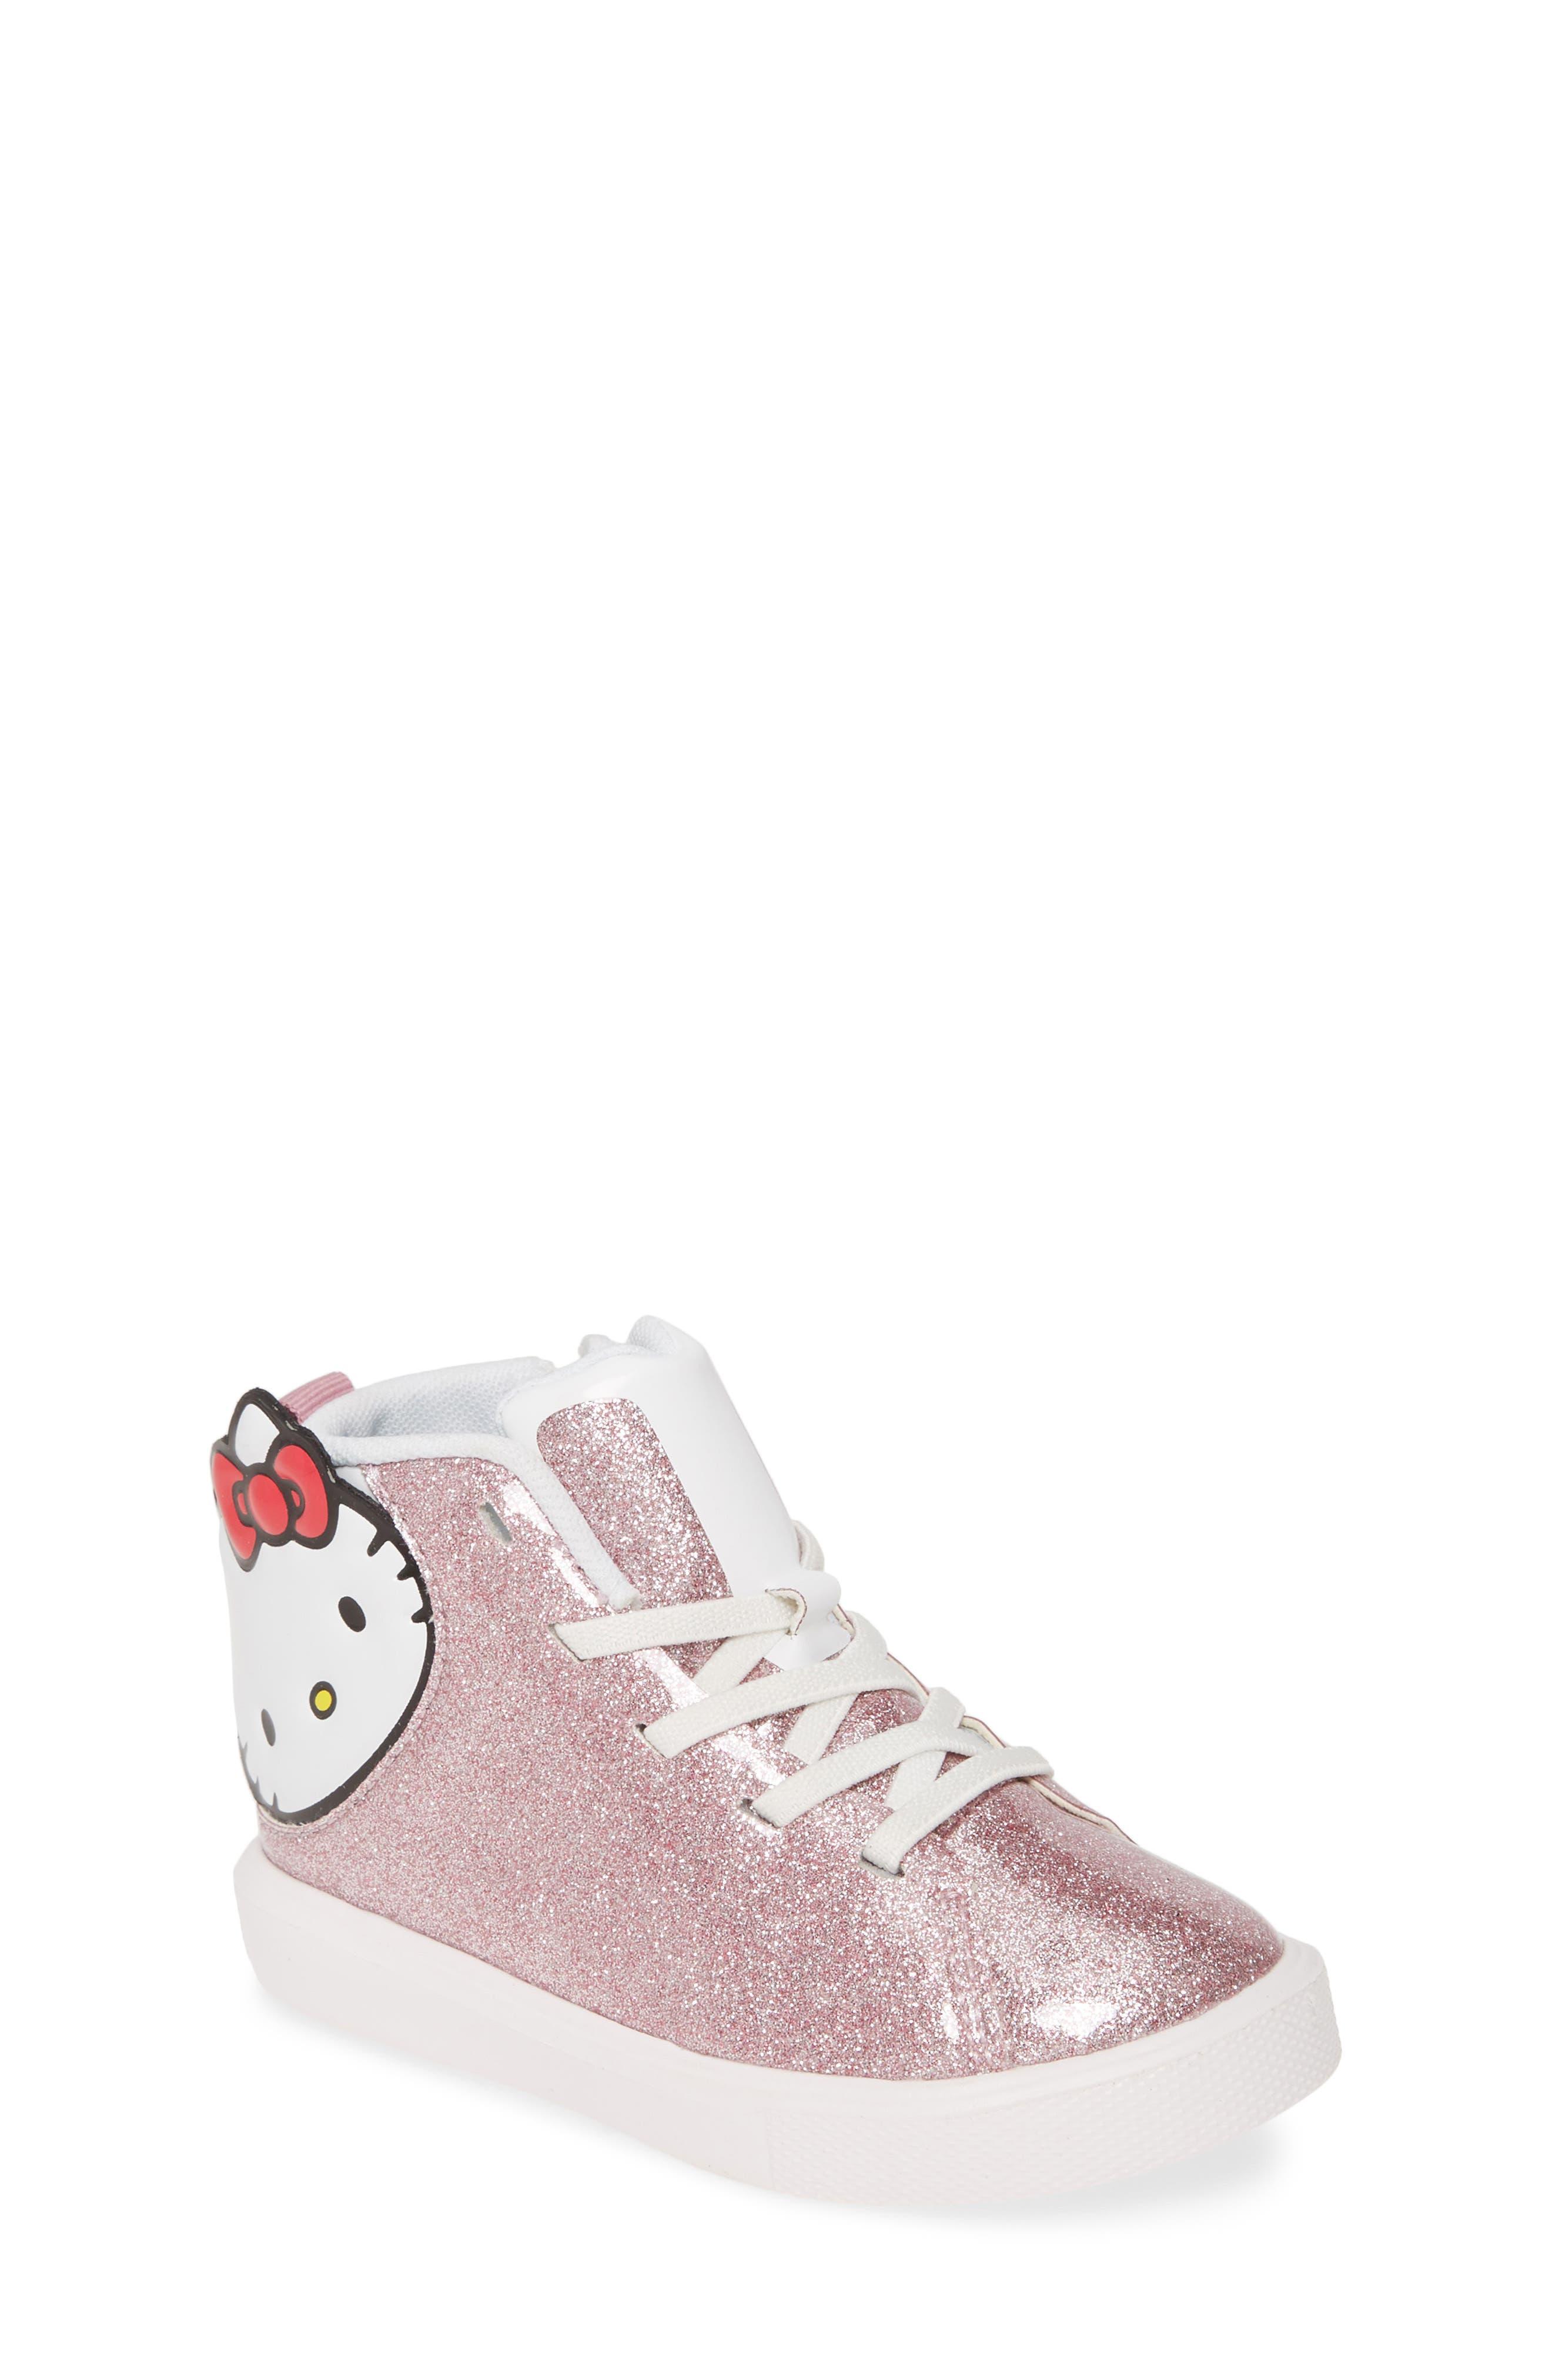 Toddler Girls Native Shoes Monaco Hello Kitty Glitter Sneaker Size 6 M  Red